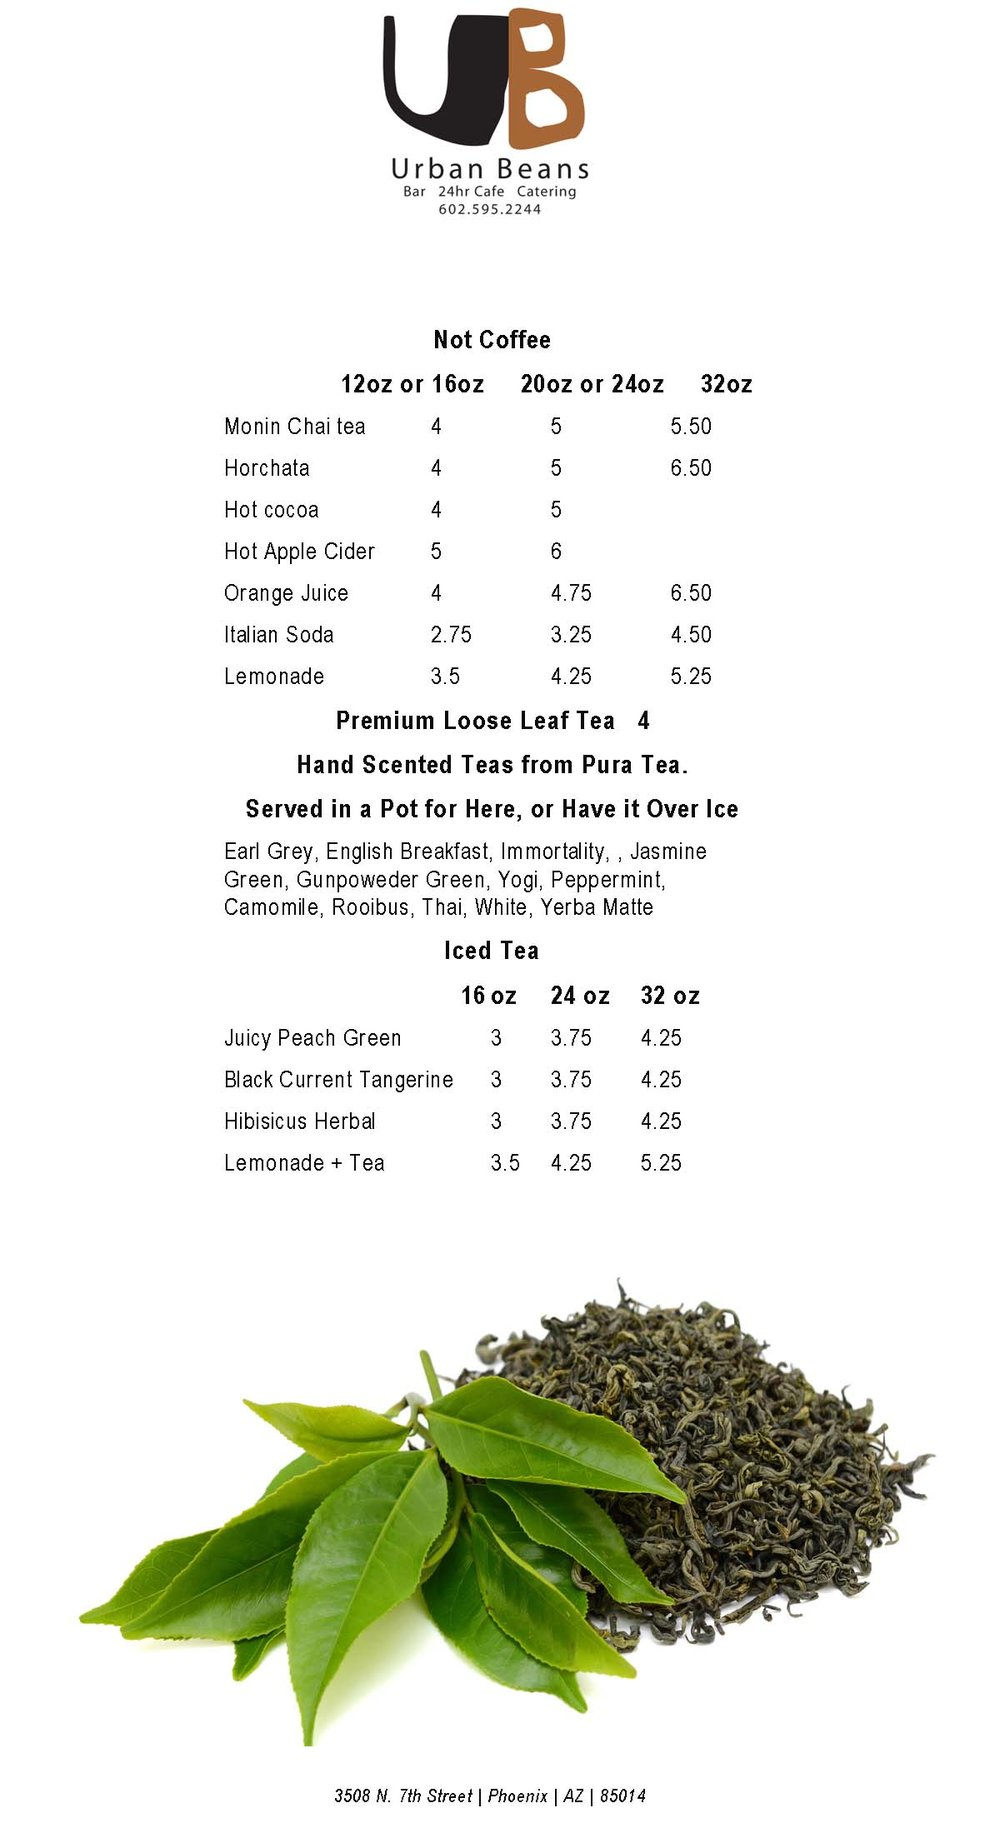 Urban Beans Tea and Non-Coffee Beverage Menu